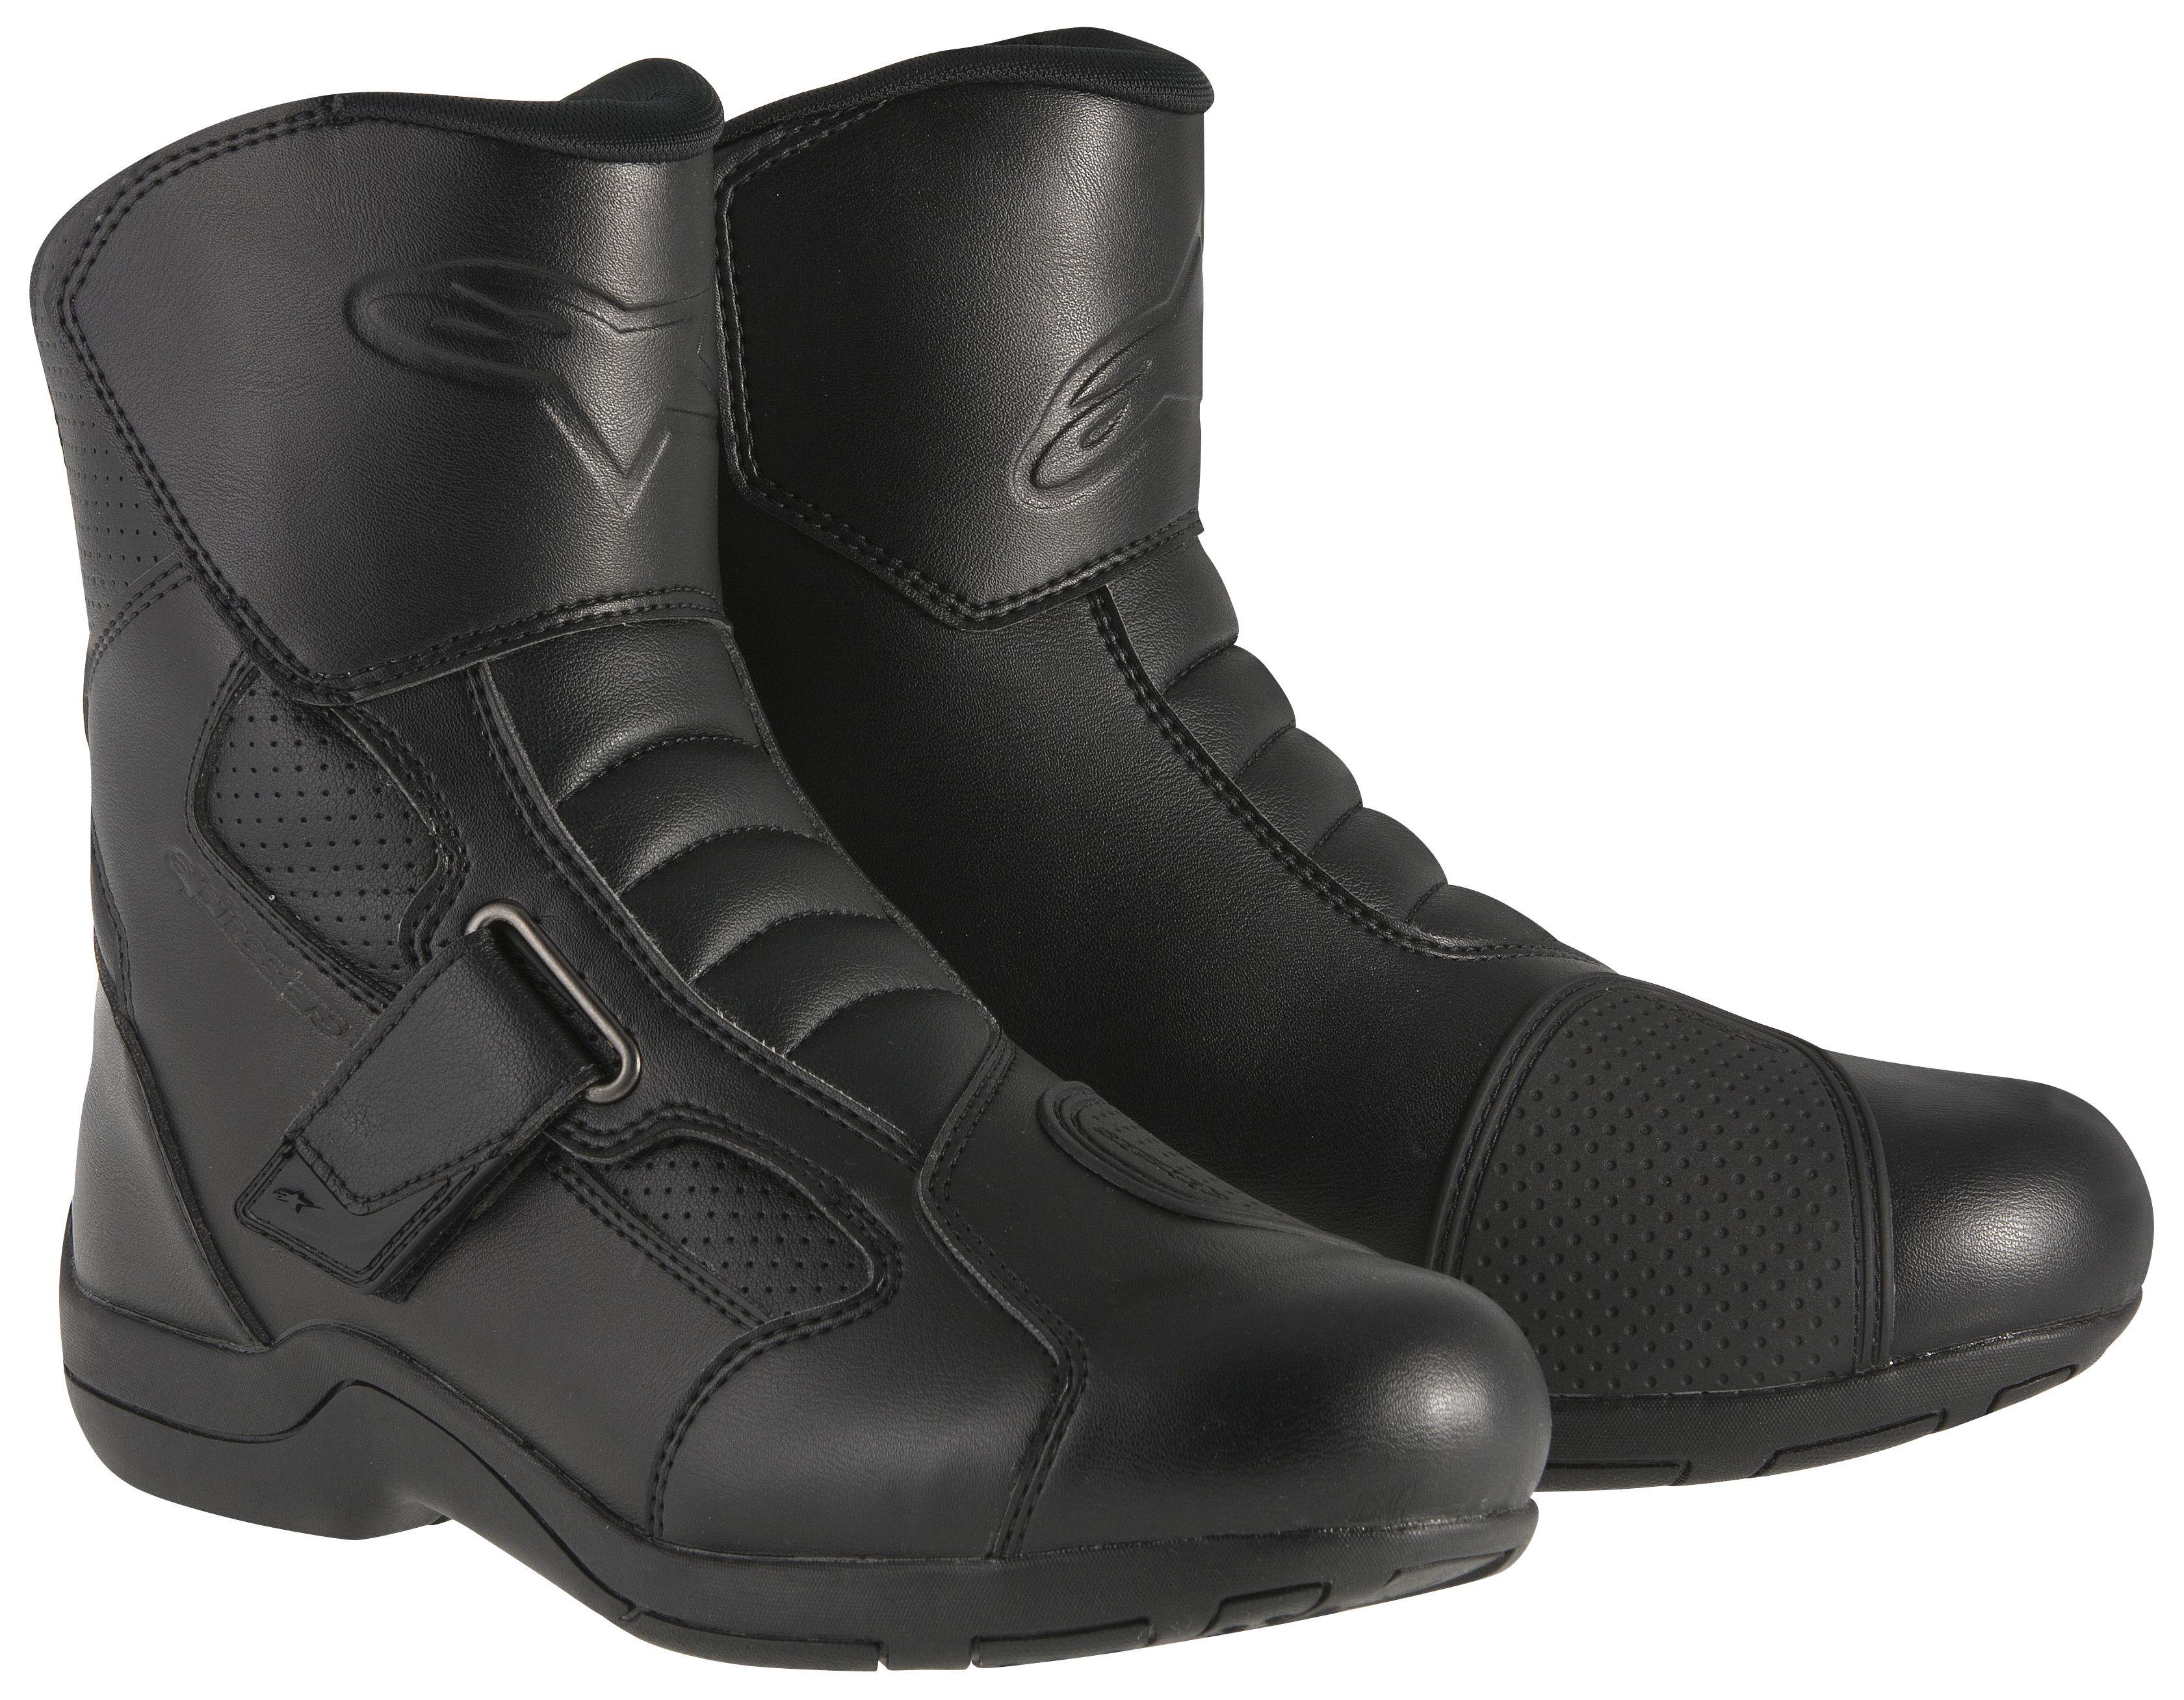 [Imagem: alpinestars_ridge_waterproof_boots.jpg]